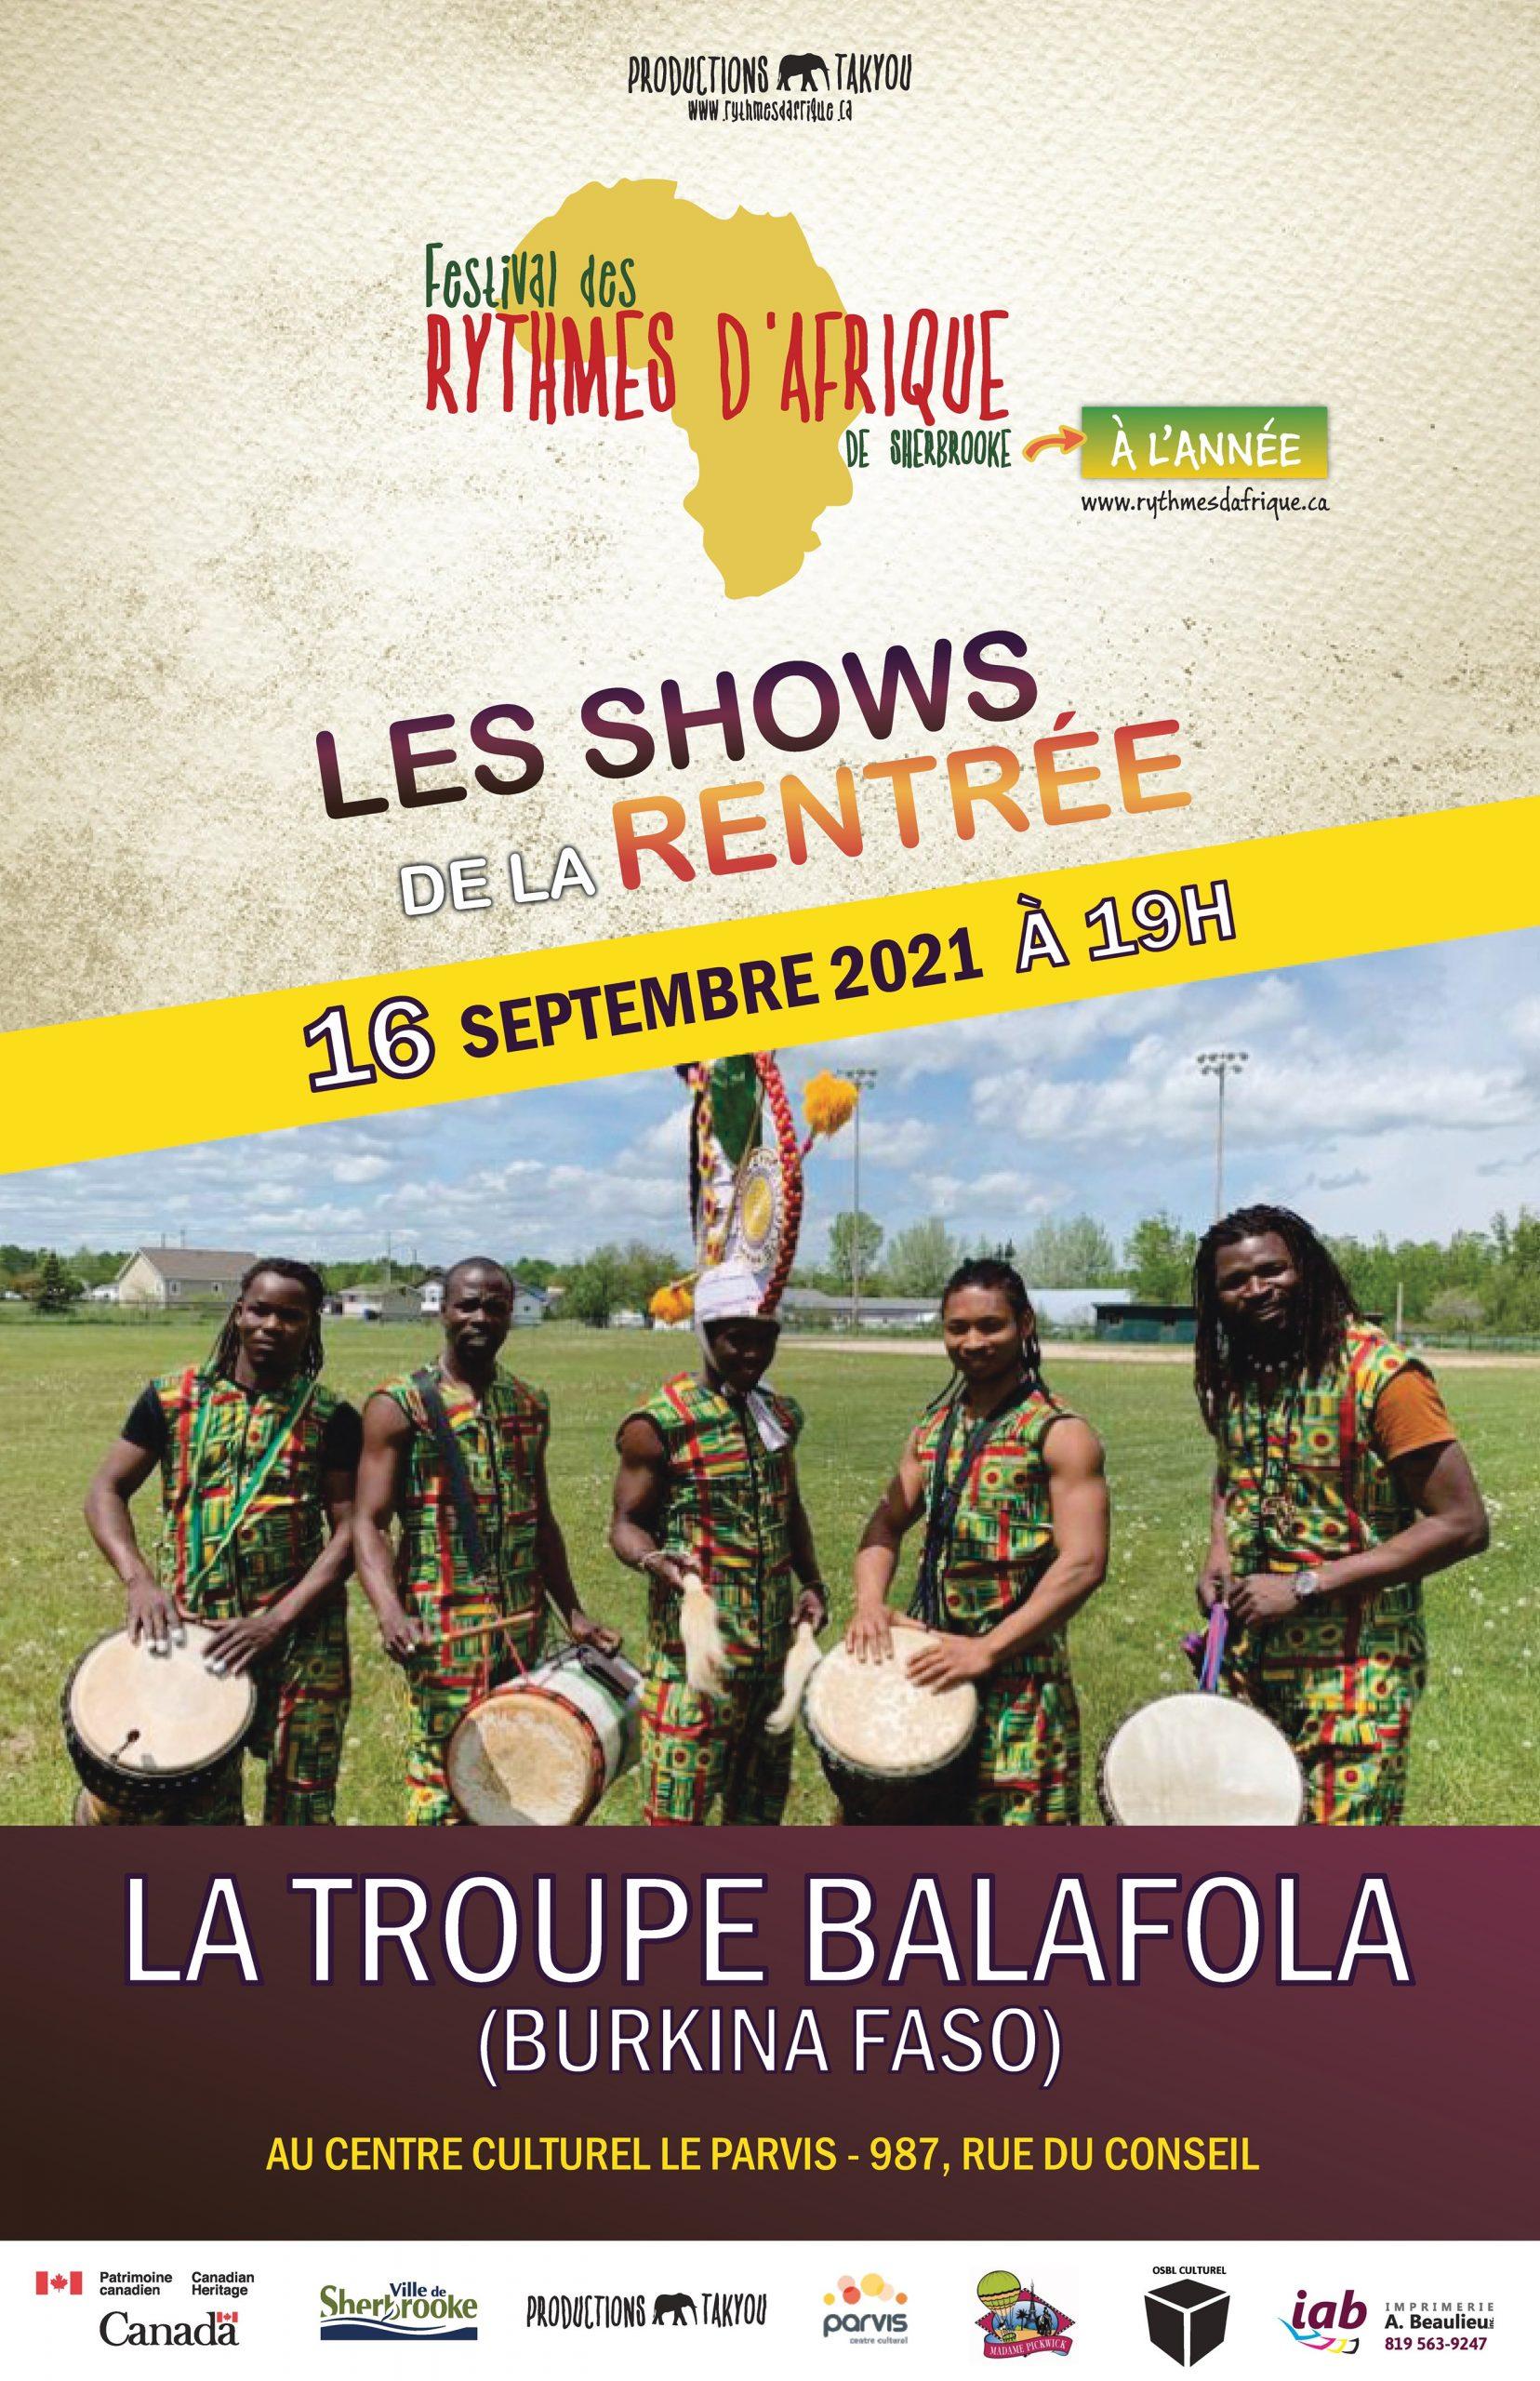 La troupe Balafola  (Burkina Faso)